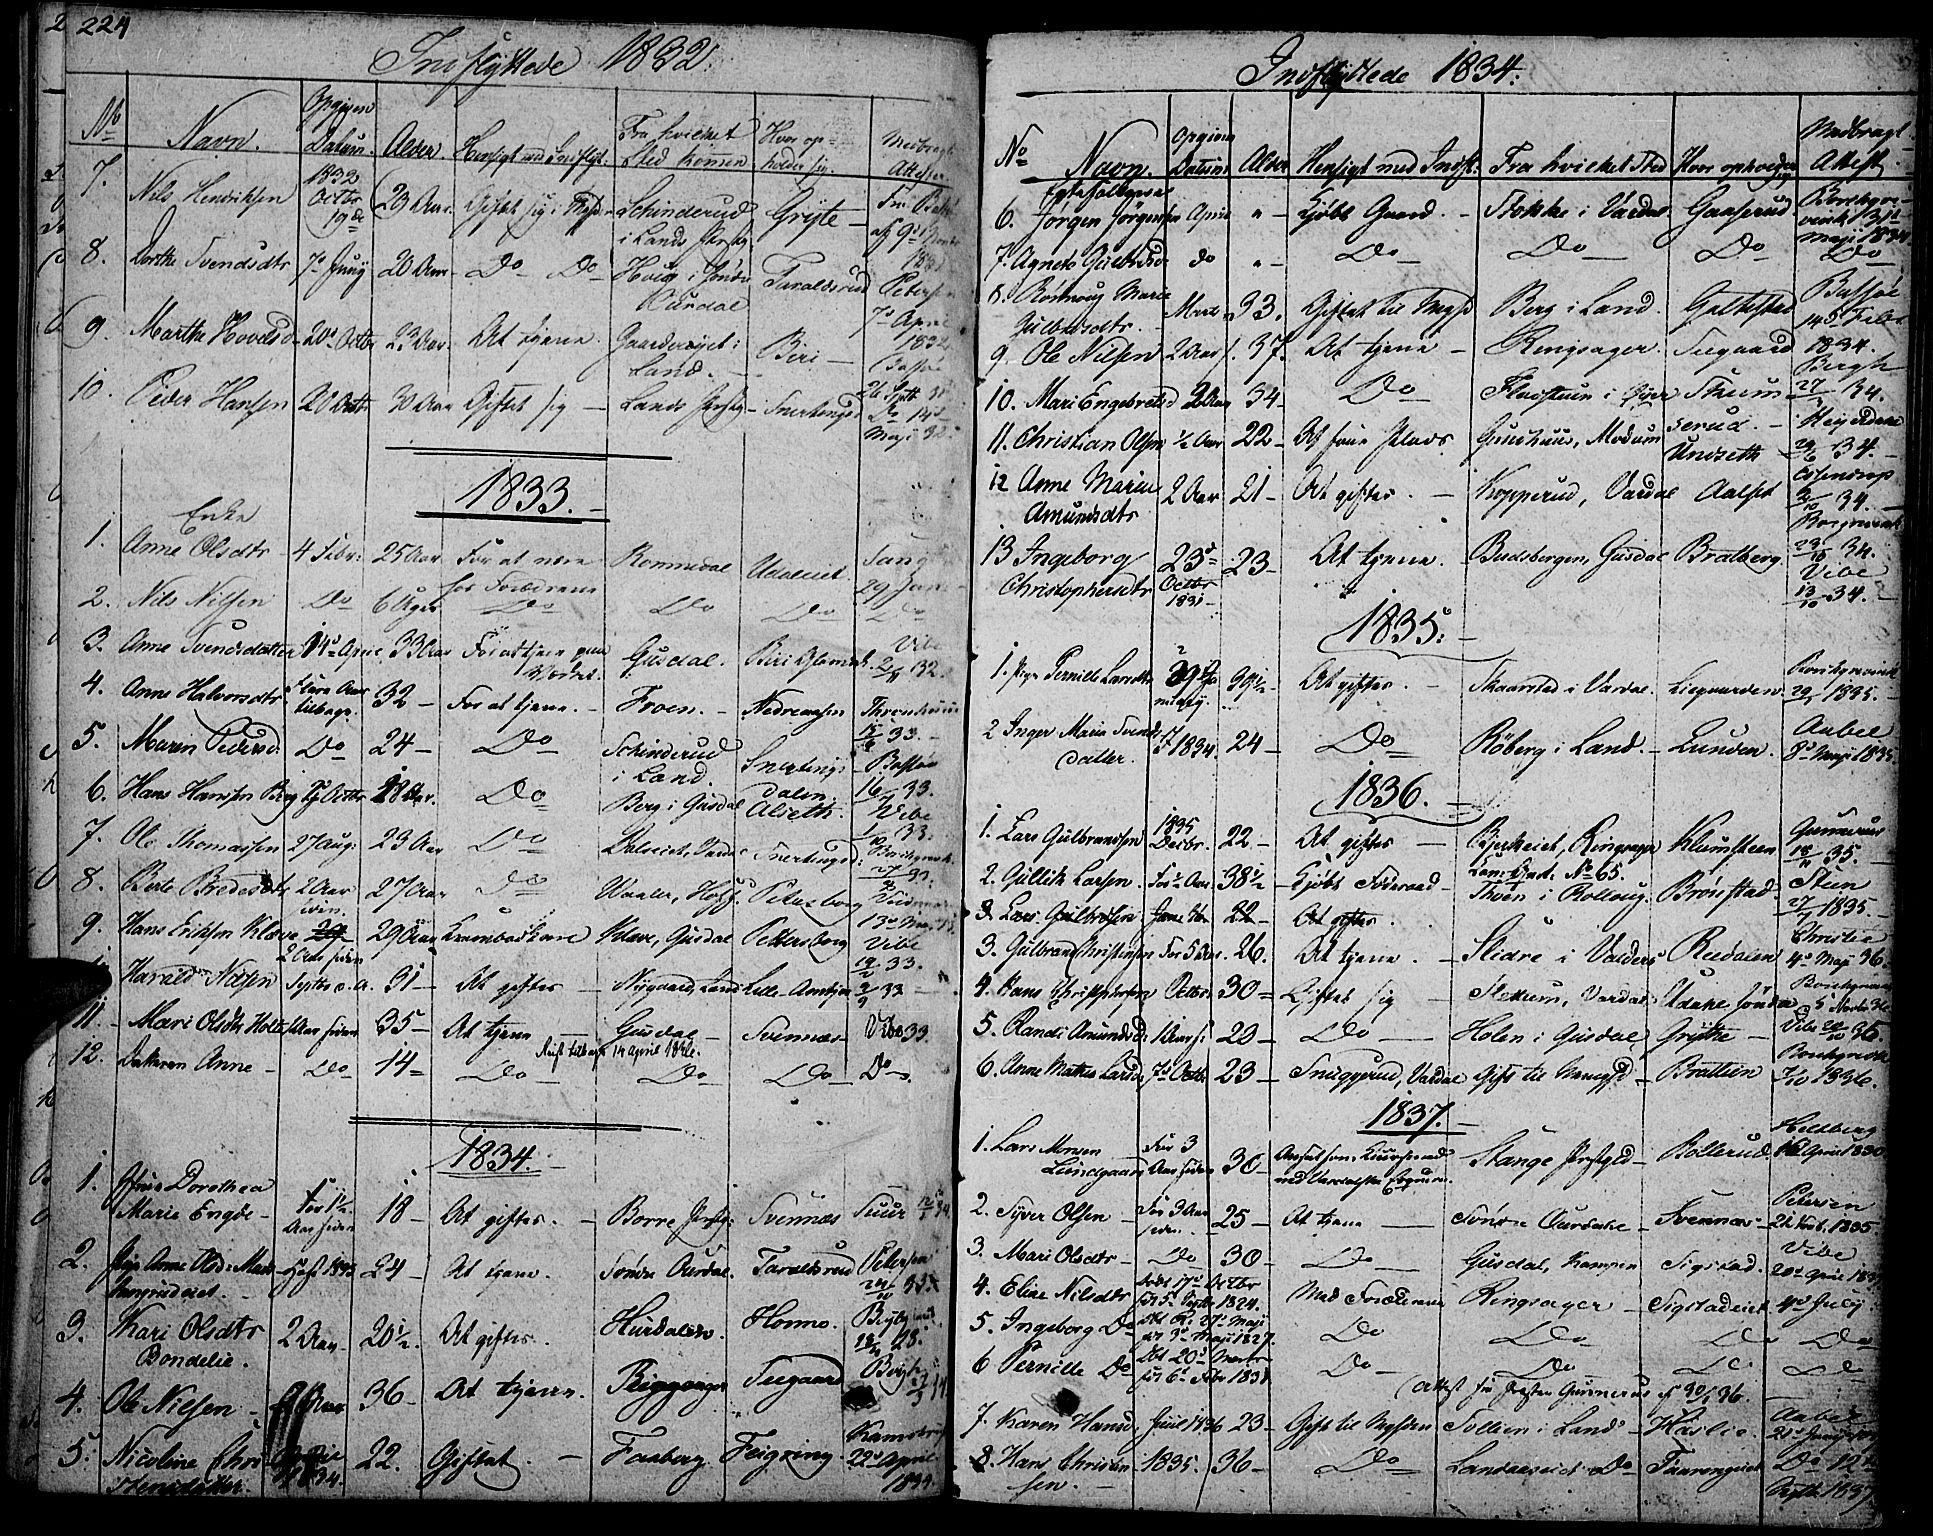 SAH, Biri prestekontor, Ministerialbok nr. 4, 1829-1842, s. 224